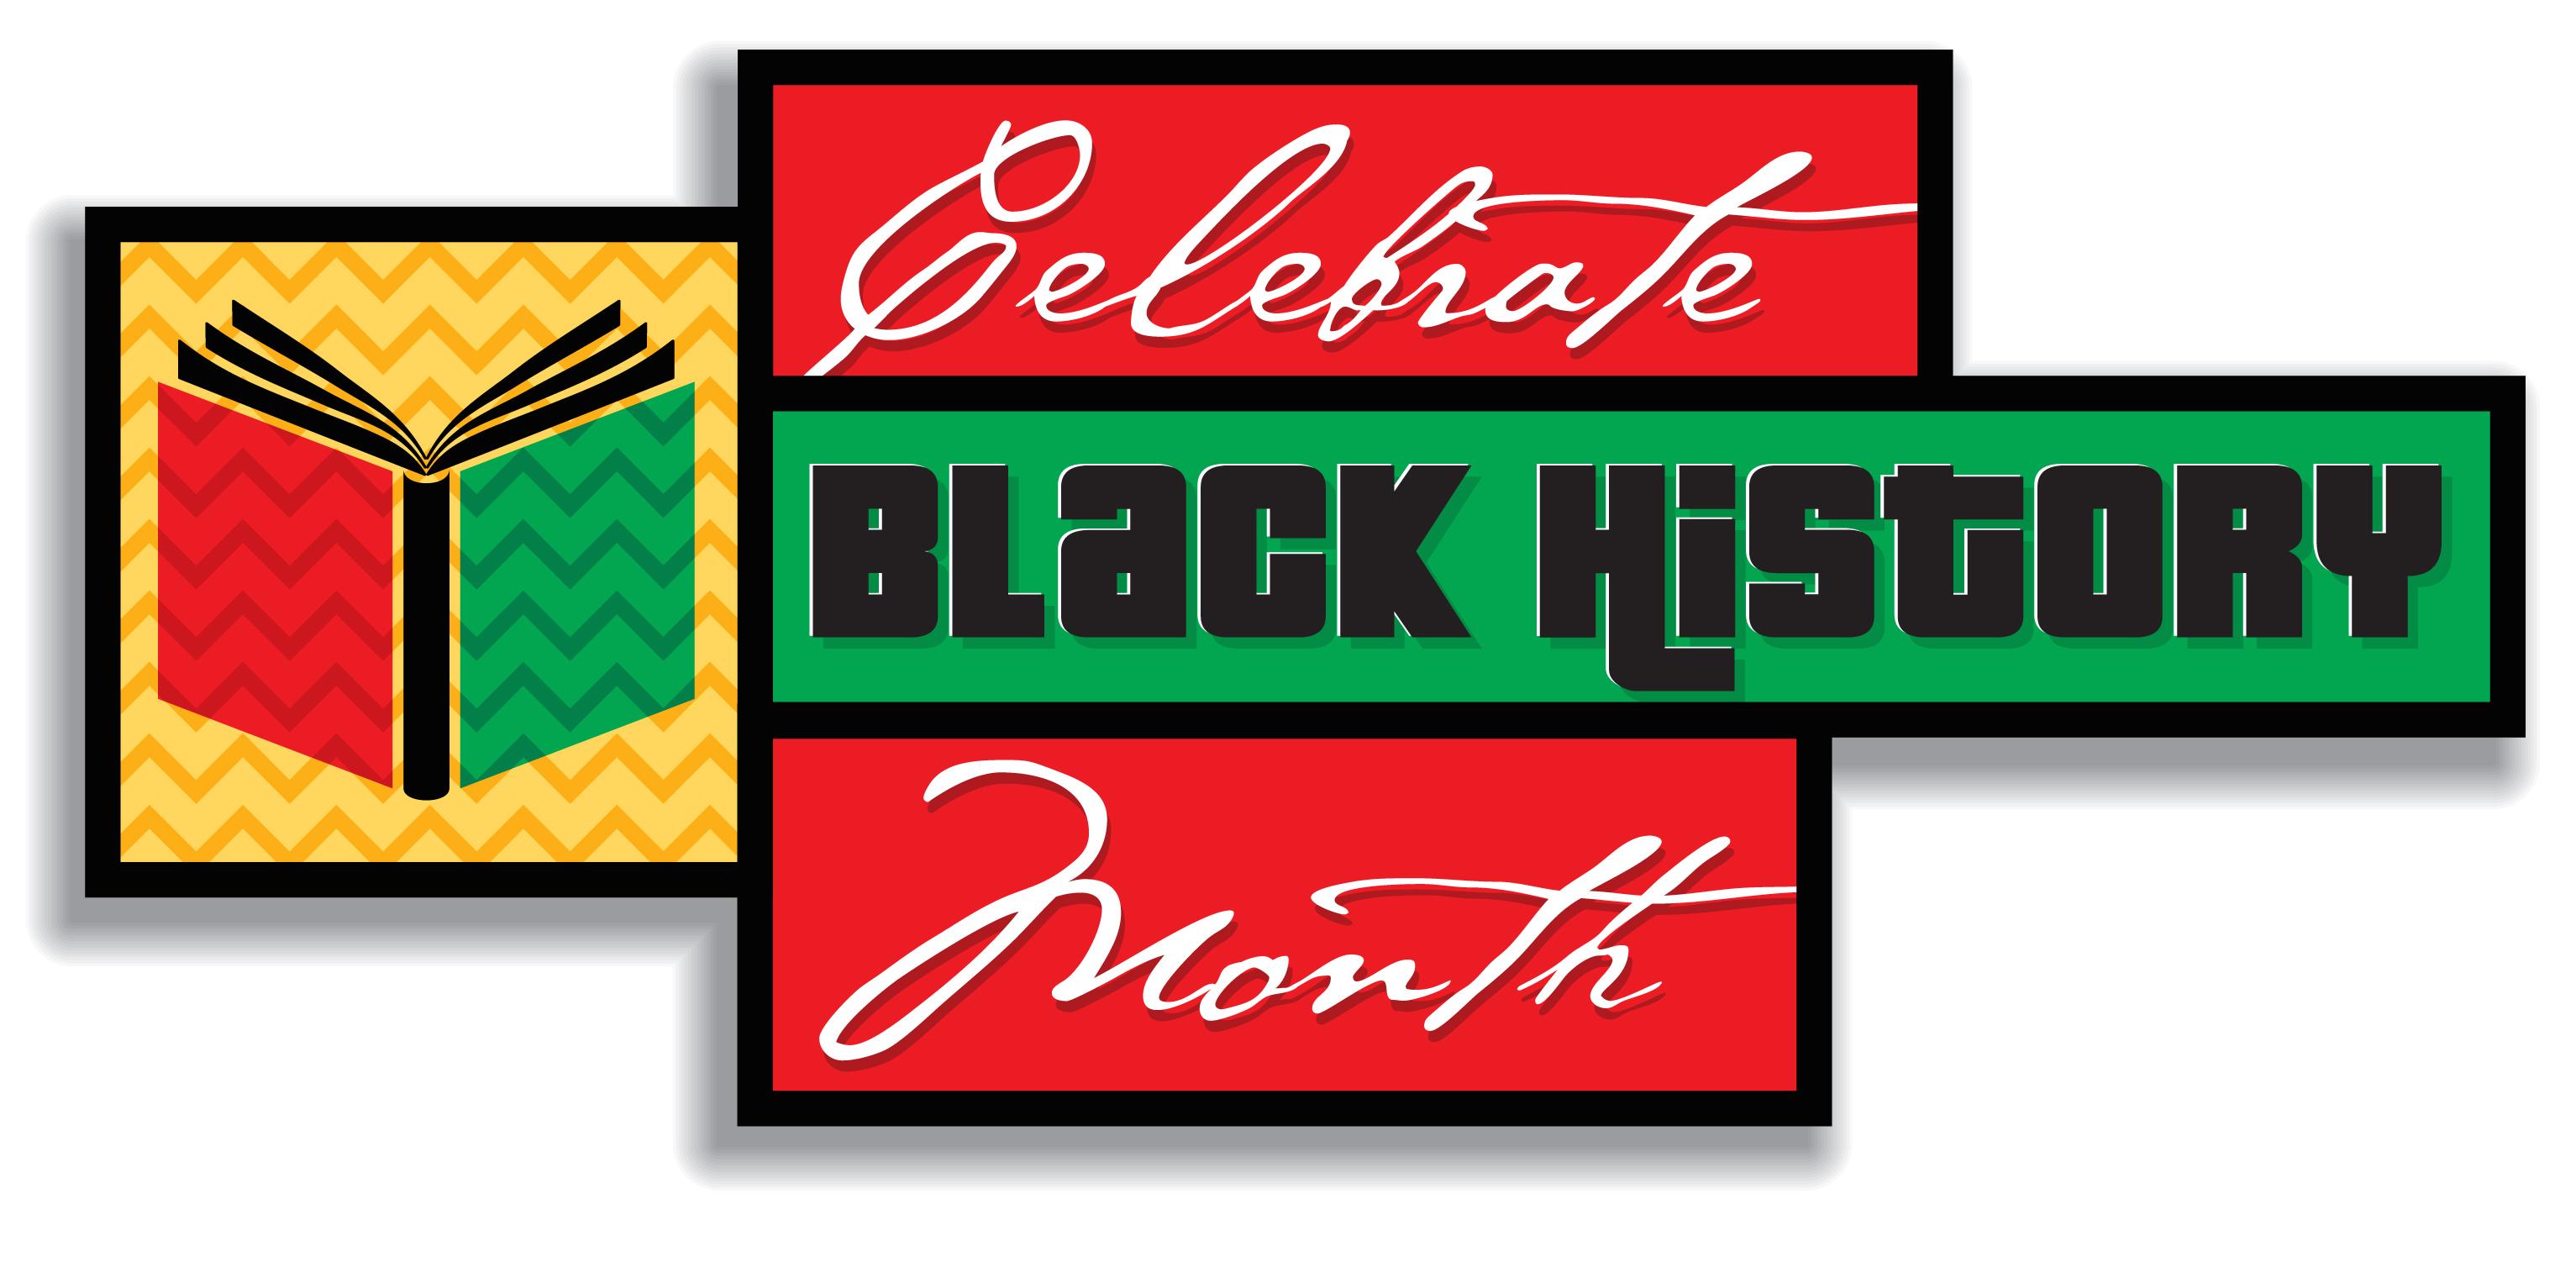 Celebrating Black History Month & Teaching Shakespeare